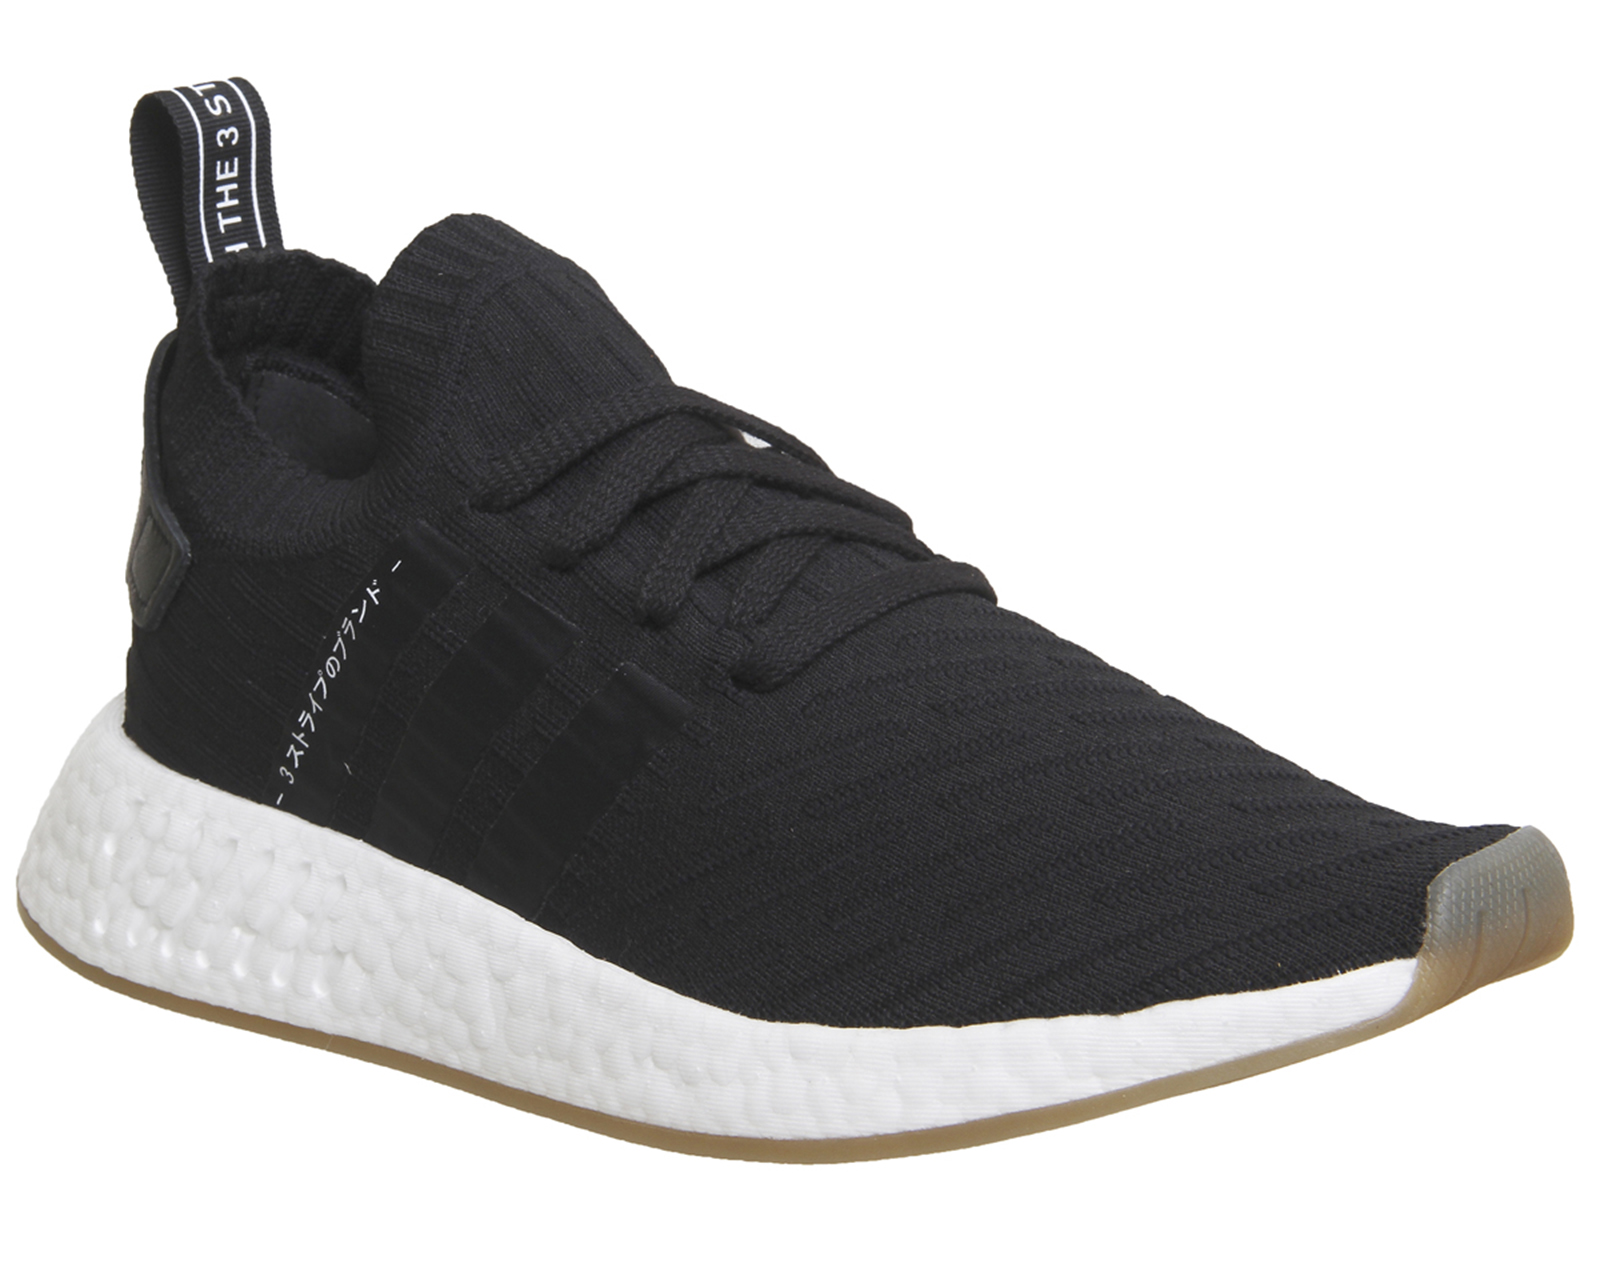 dd9873f10dbd Sentinel Mens Adidas Nmd R2 Pk Trainers Black White Trainers Shoes